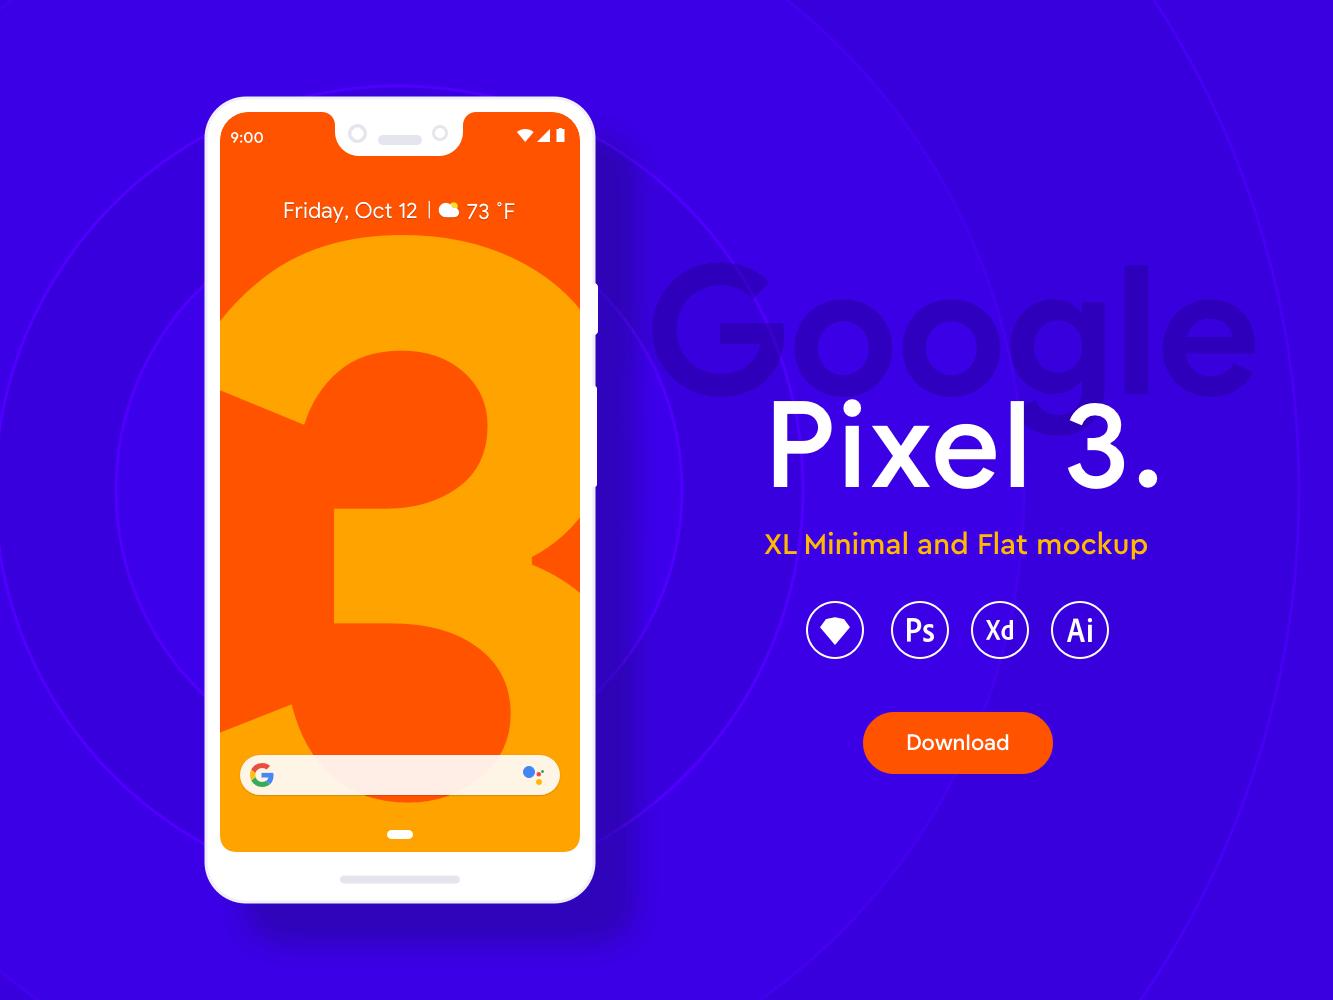 Pixel 3 XL mockup cover image